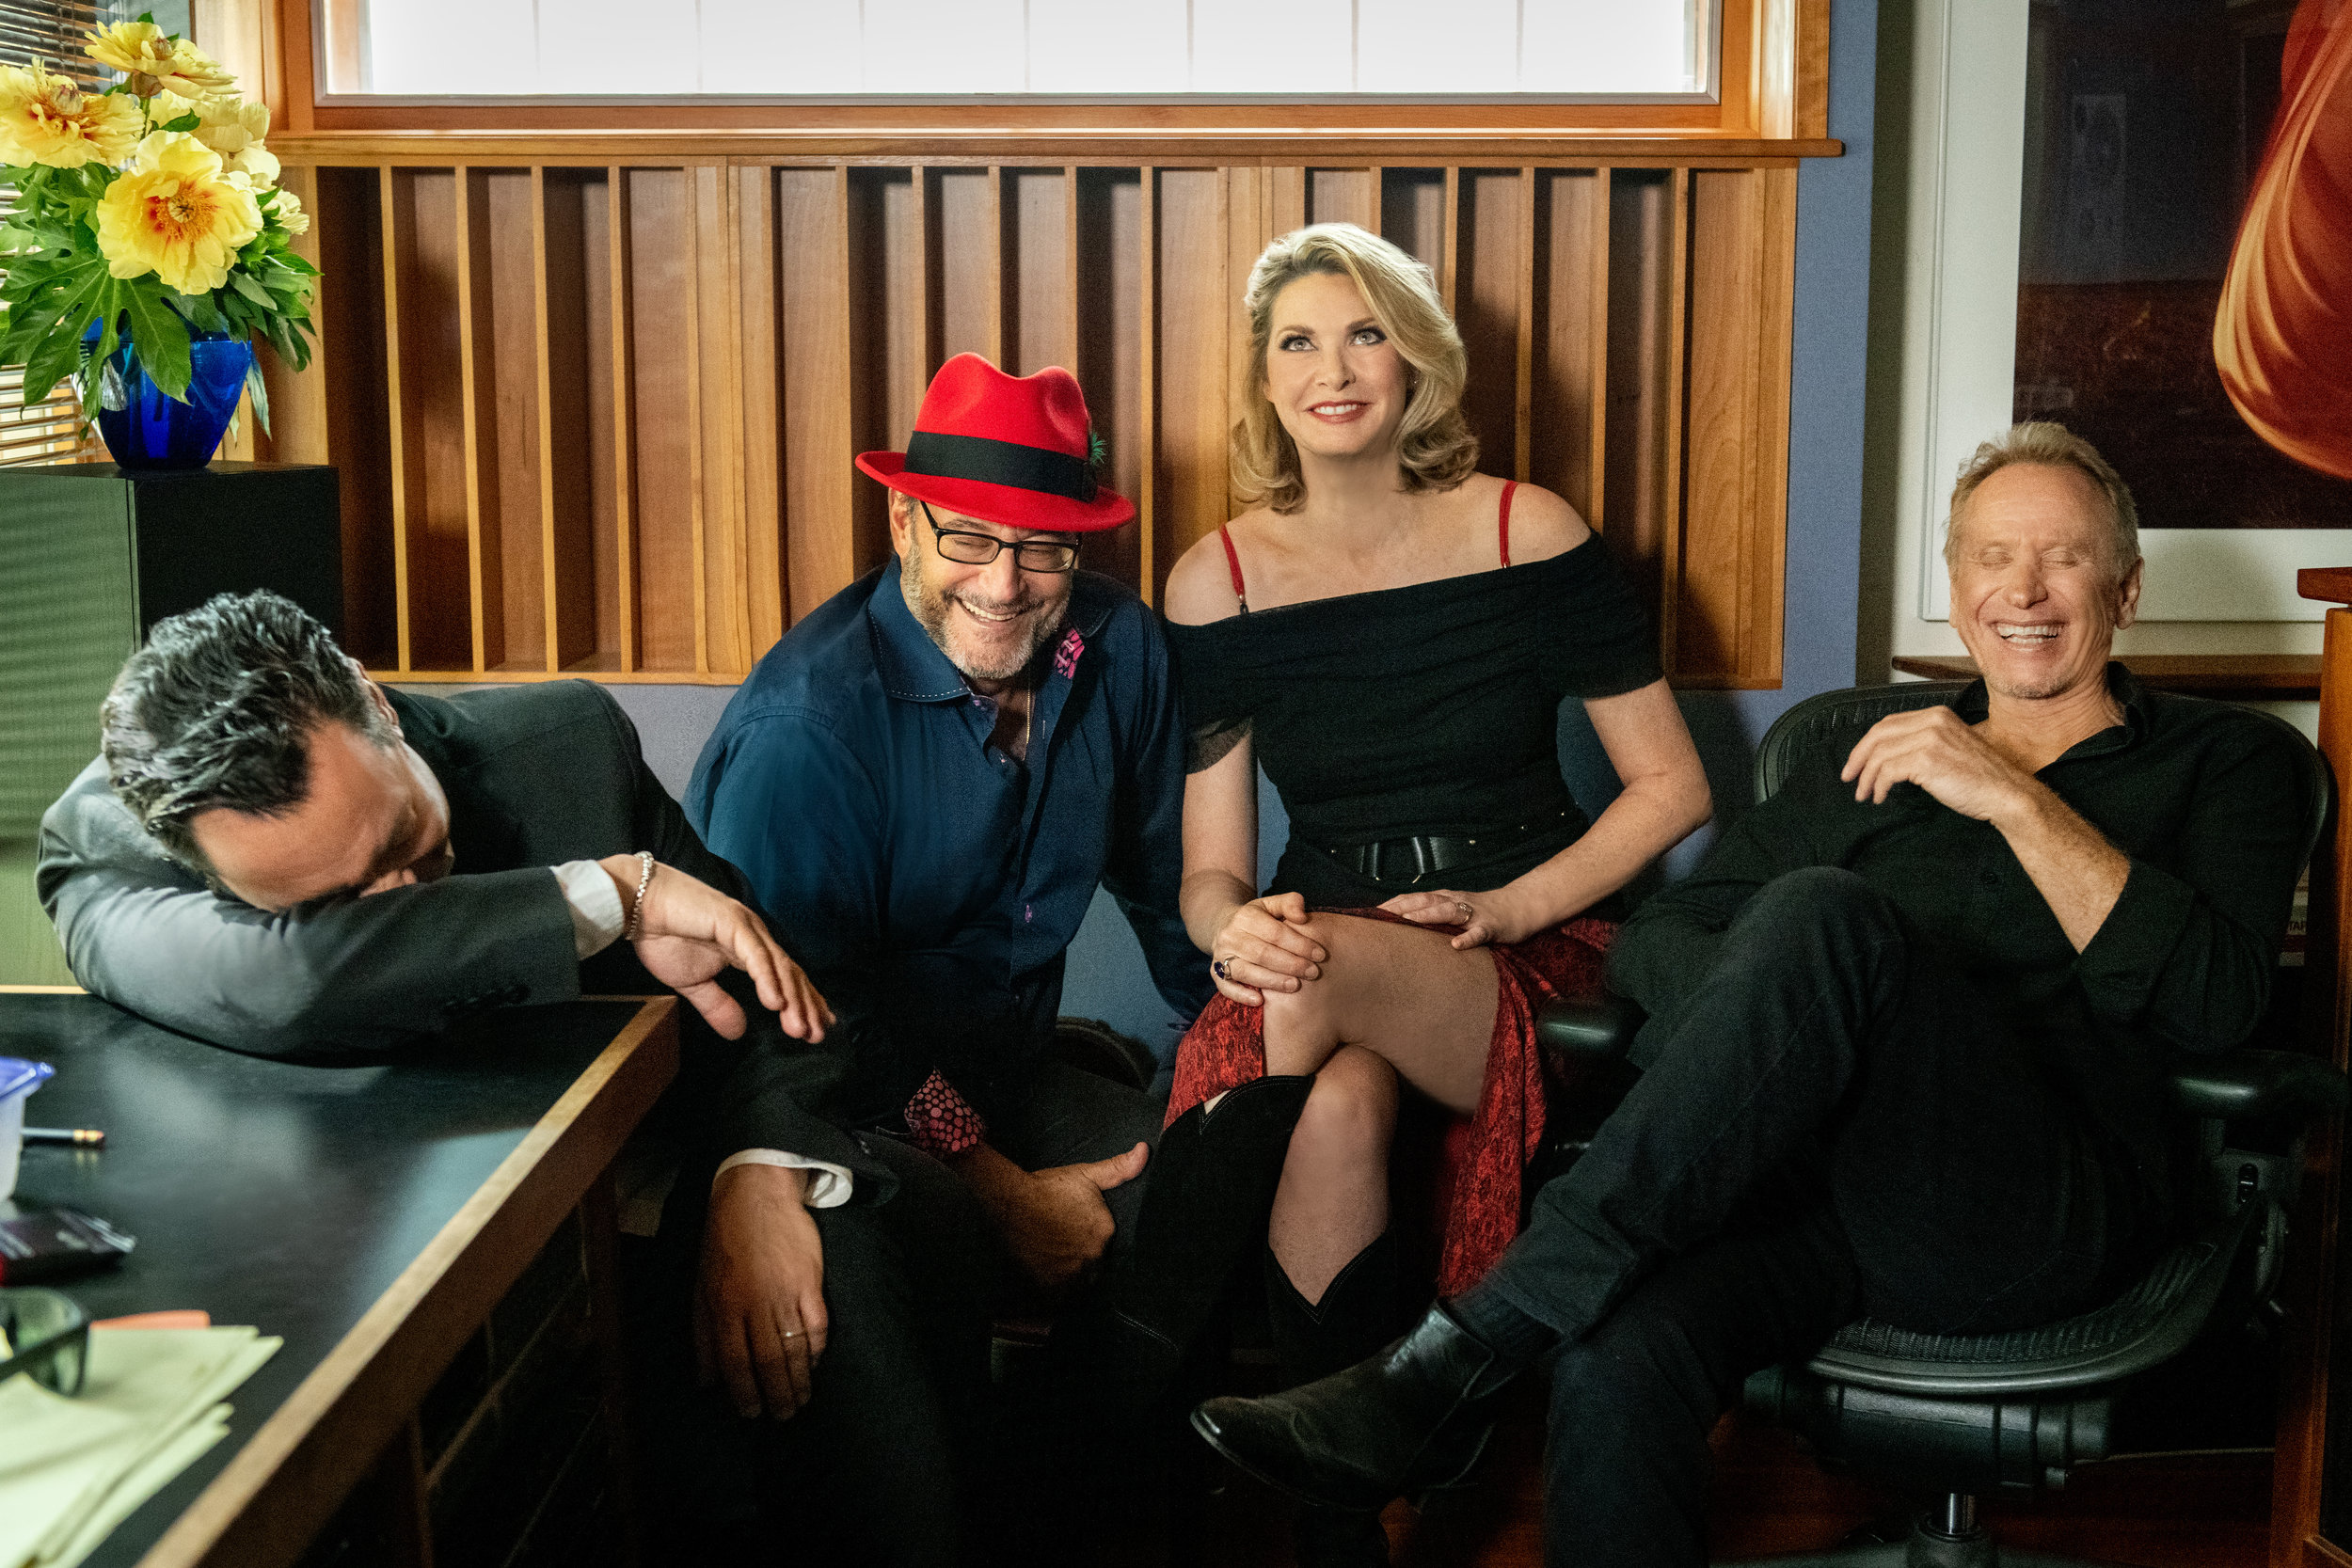 Photo by Liz Linder ( lizlinder.com)